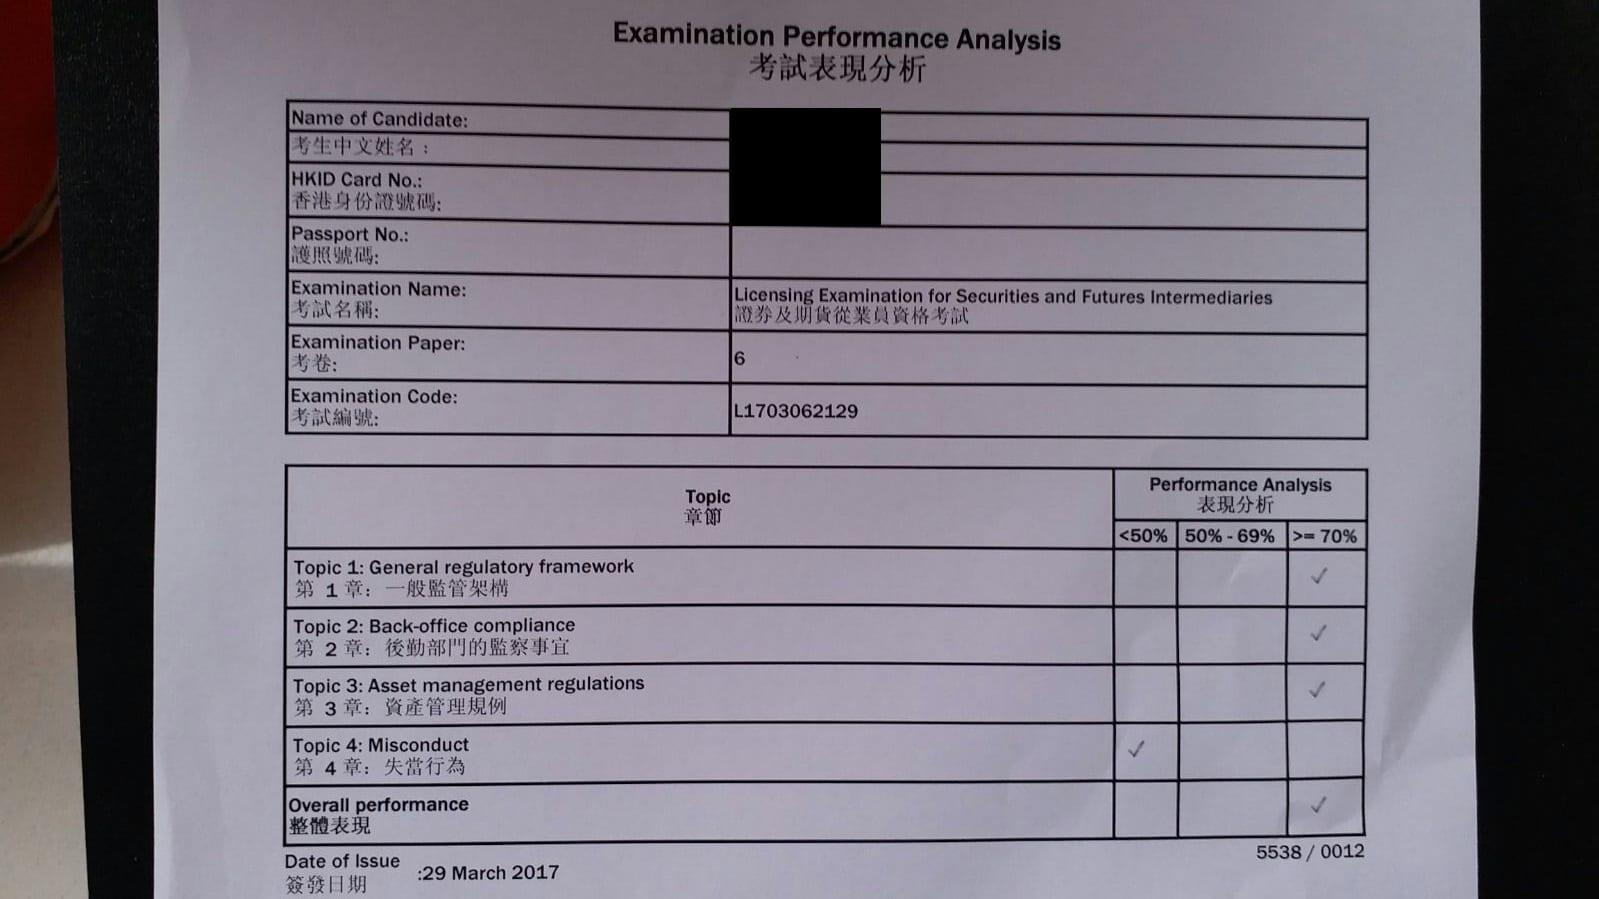 HPH 29/3/2017 LE Paper 6 證券期貨從業員資格考試卷六 Pass